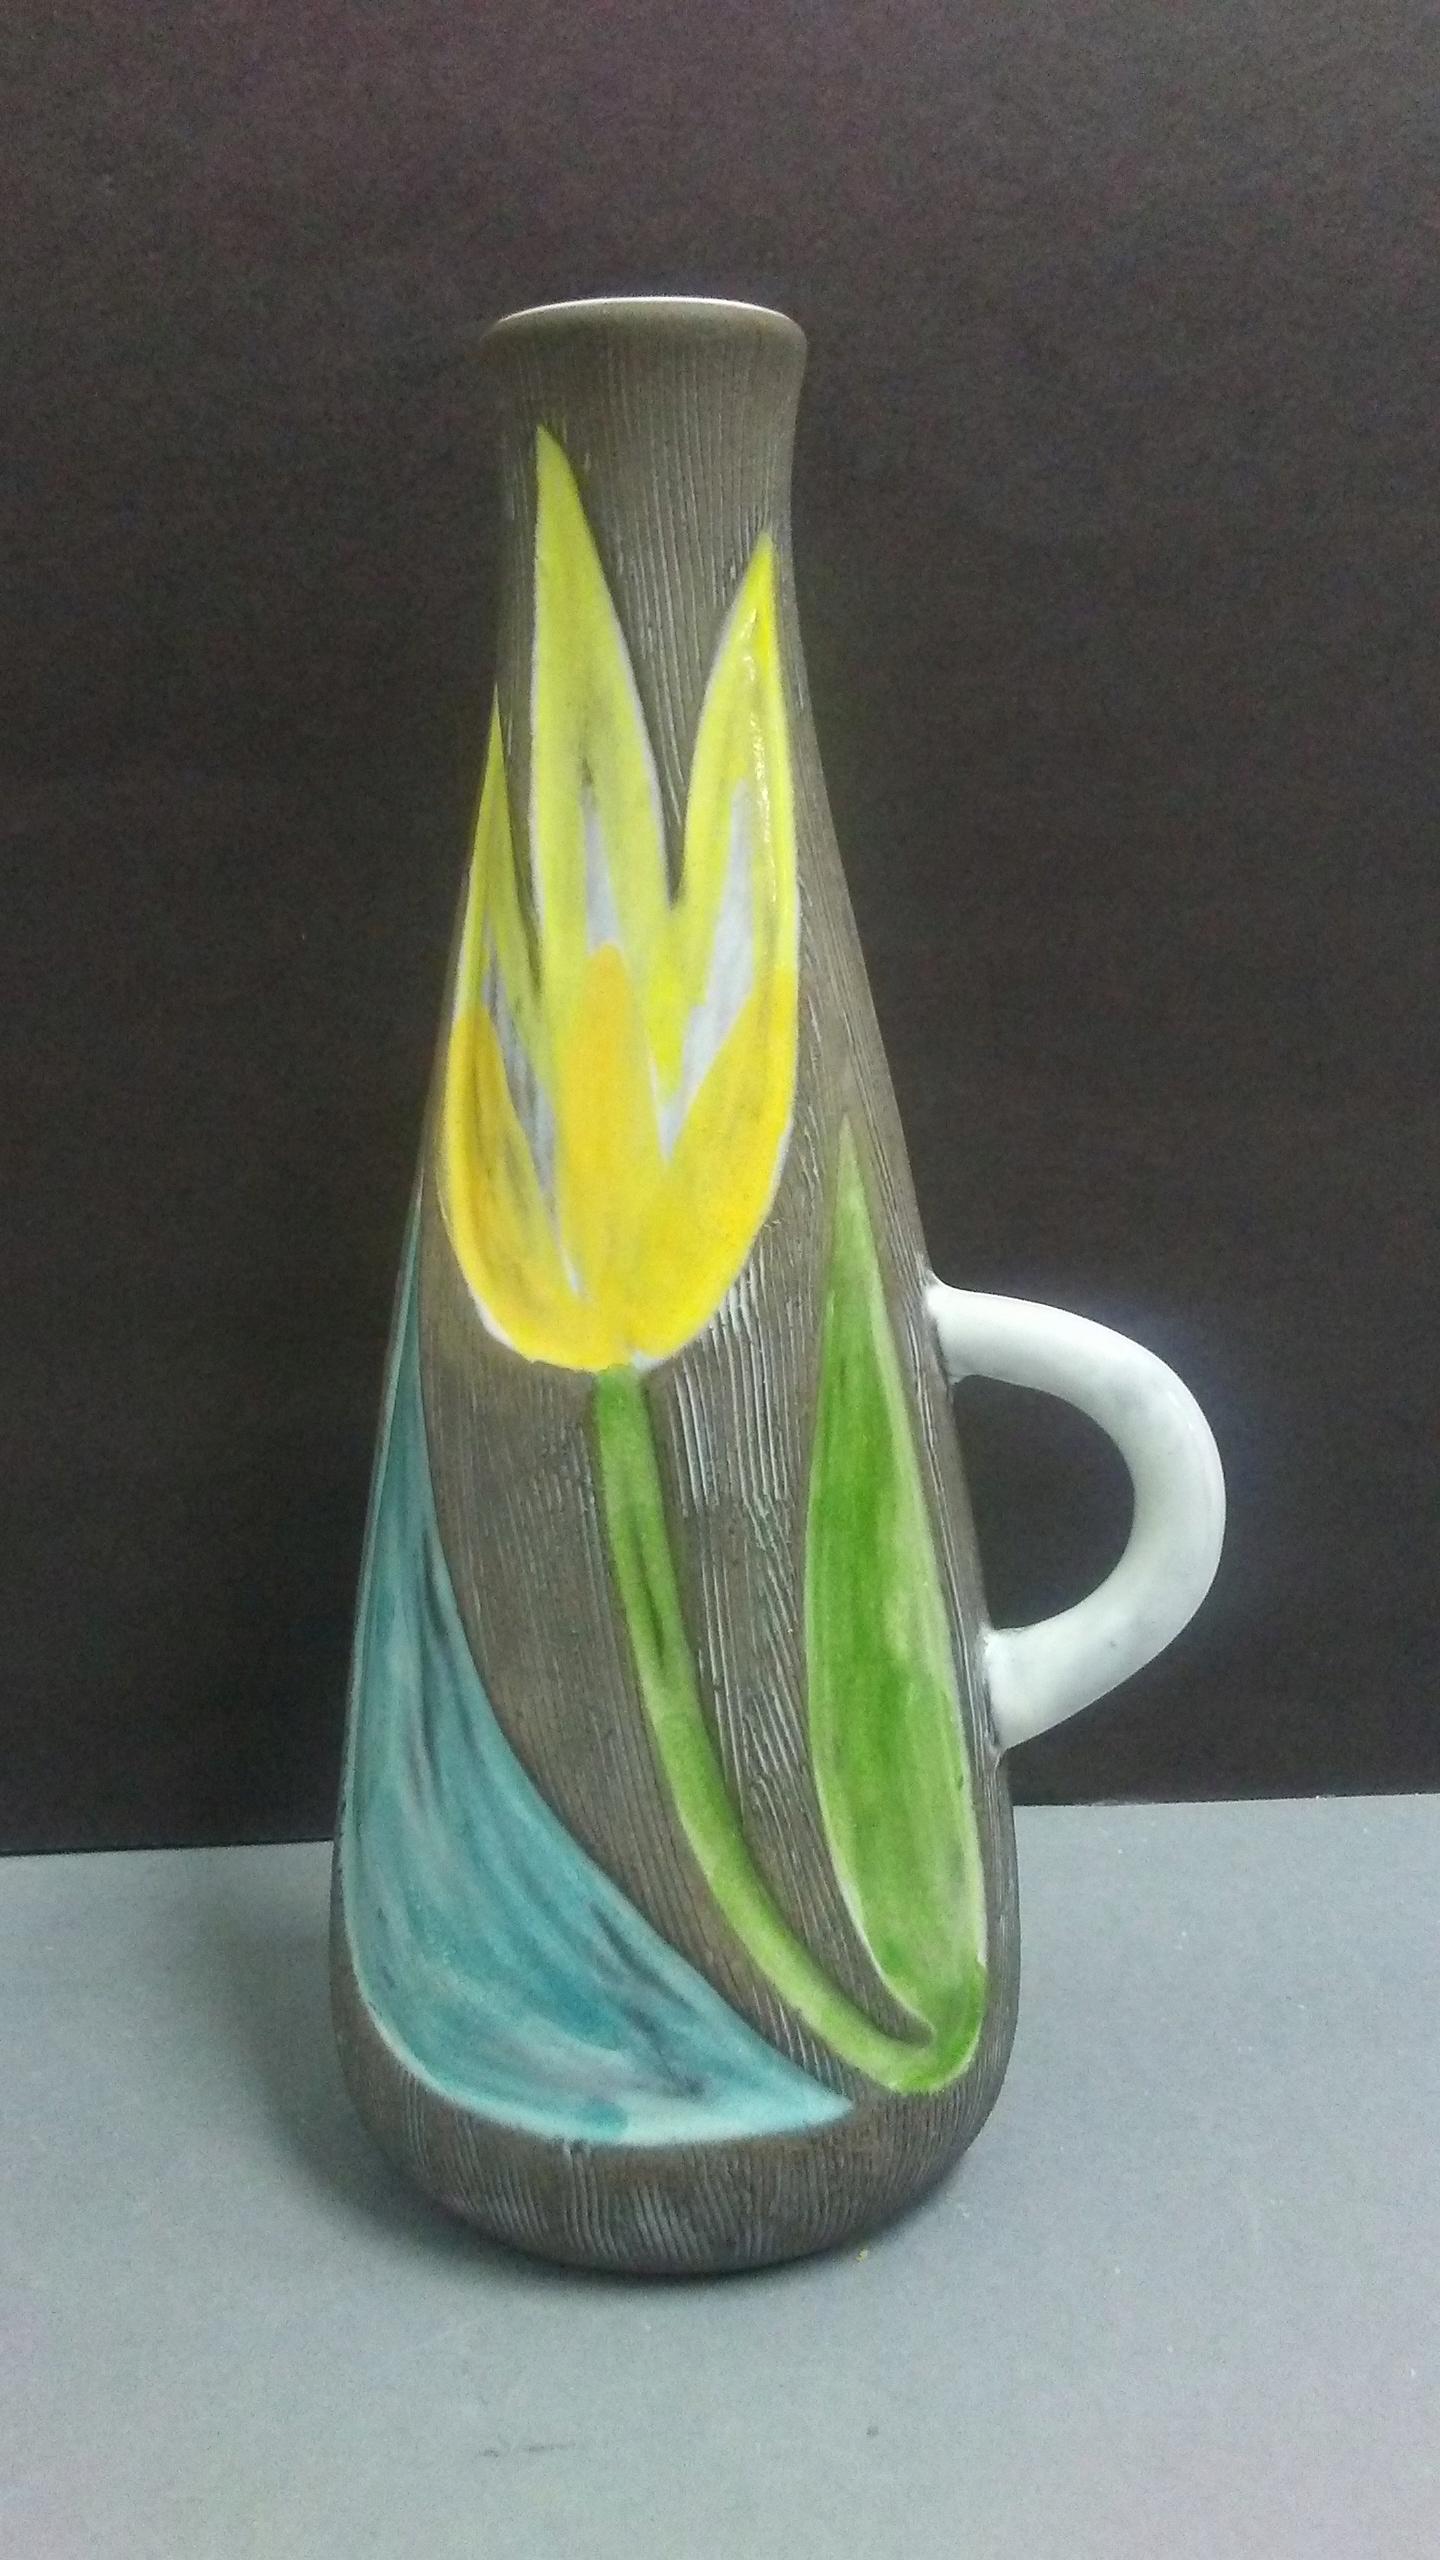 Тюльпан ваза керамика арт Mari Simmulson Upsala E